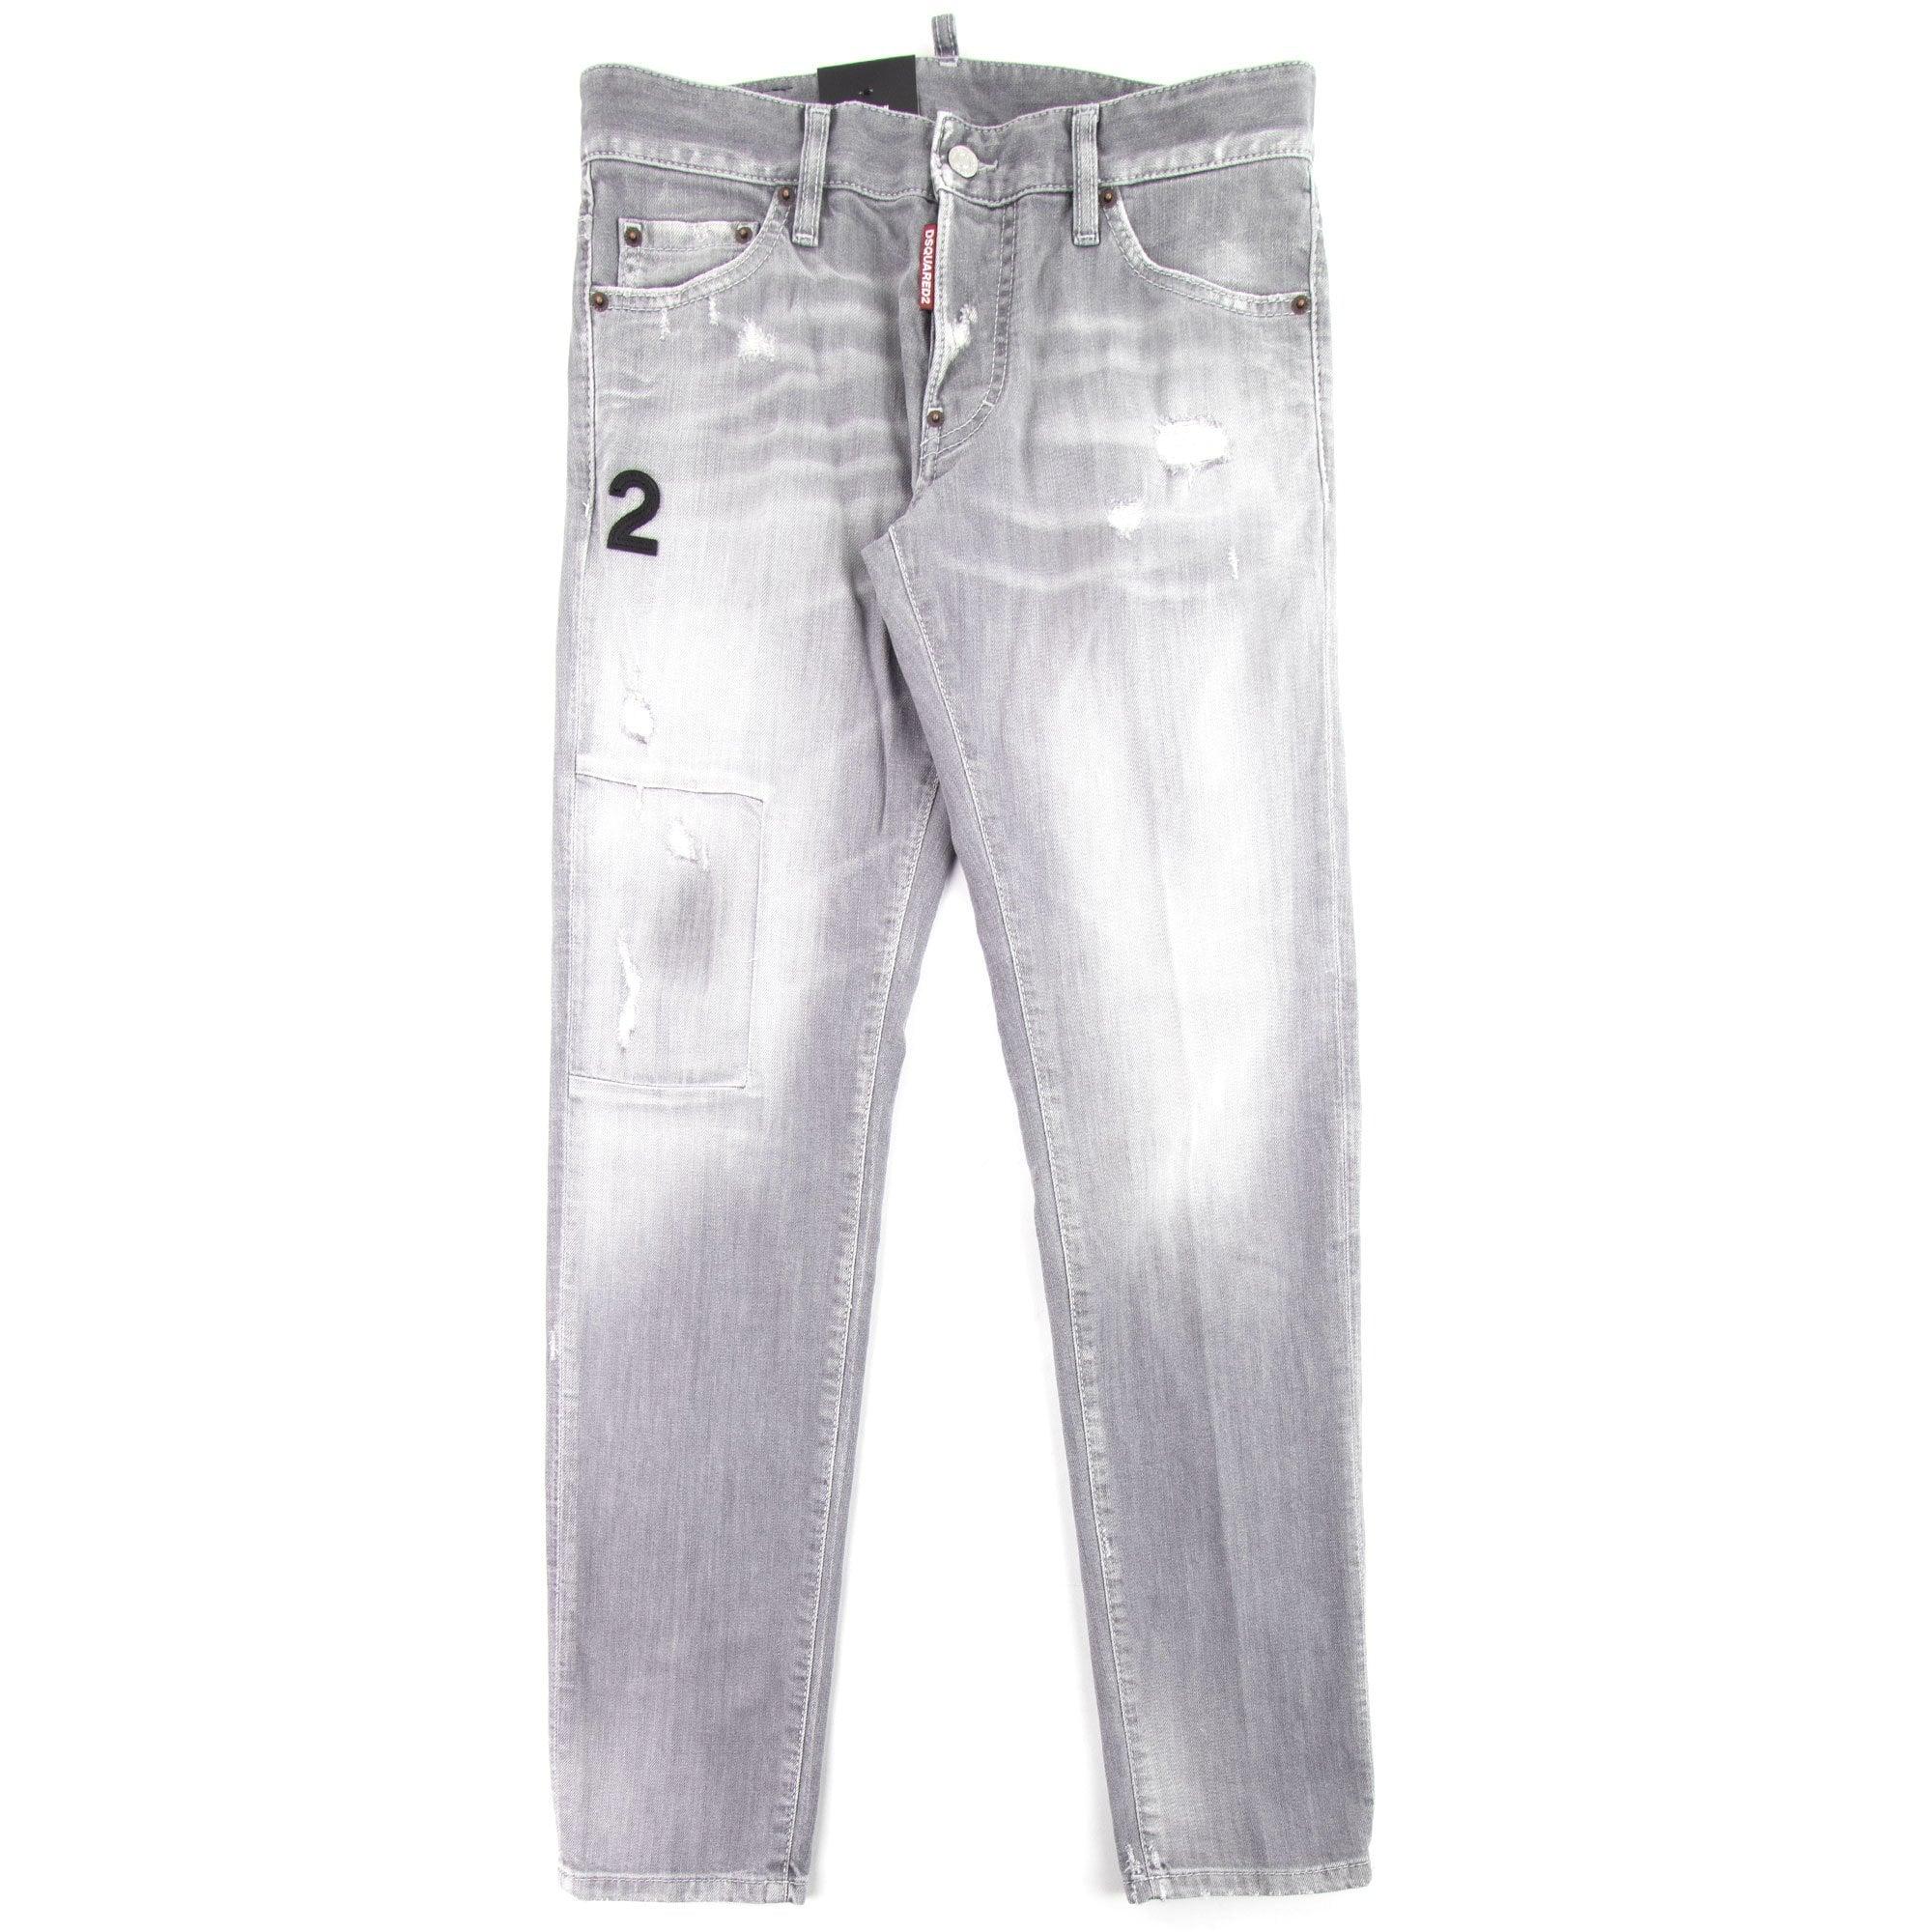 dsquared2 jean grey